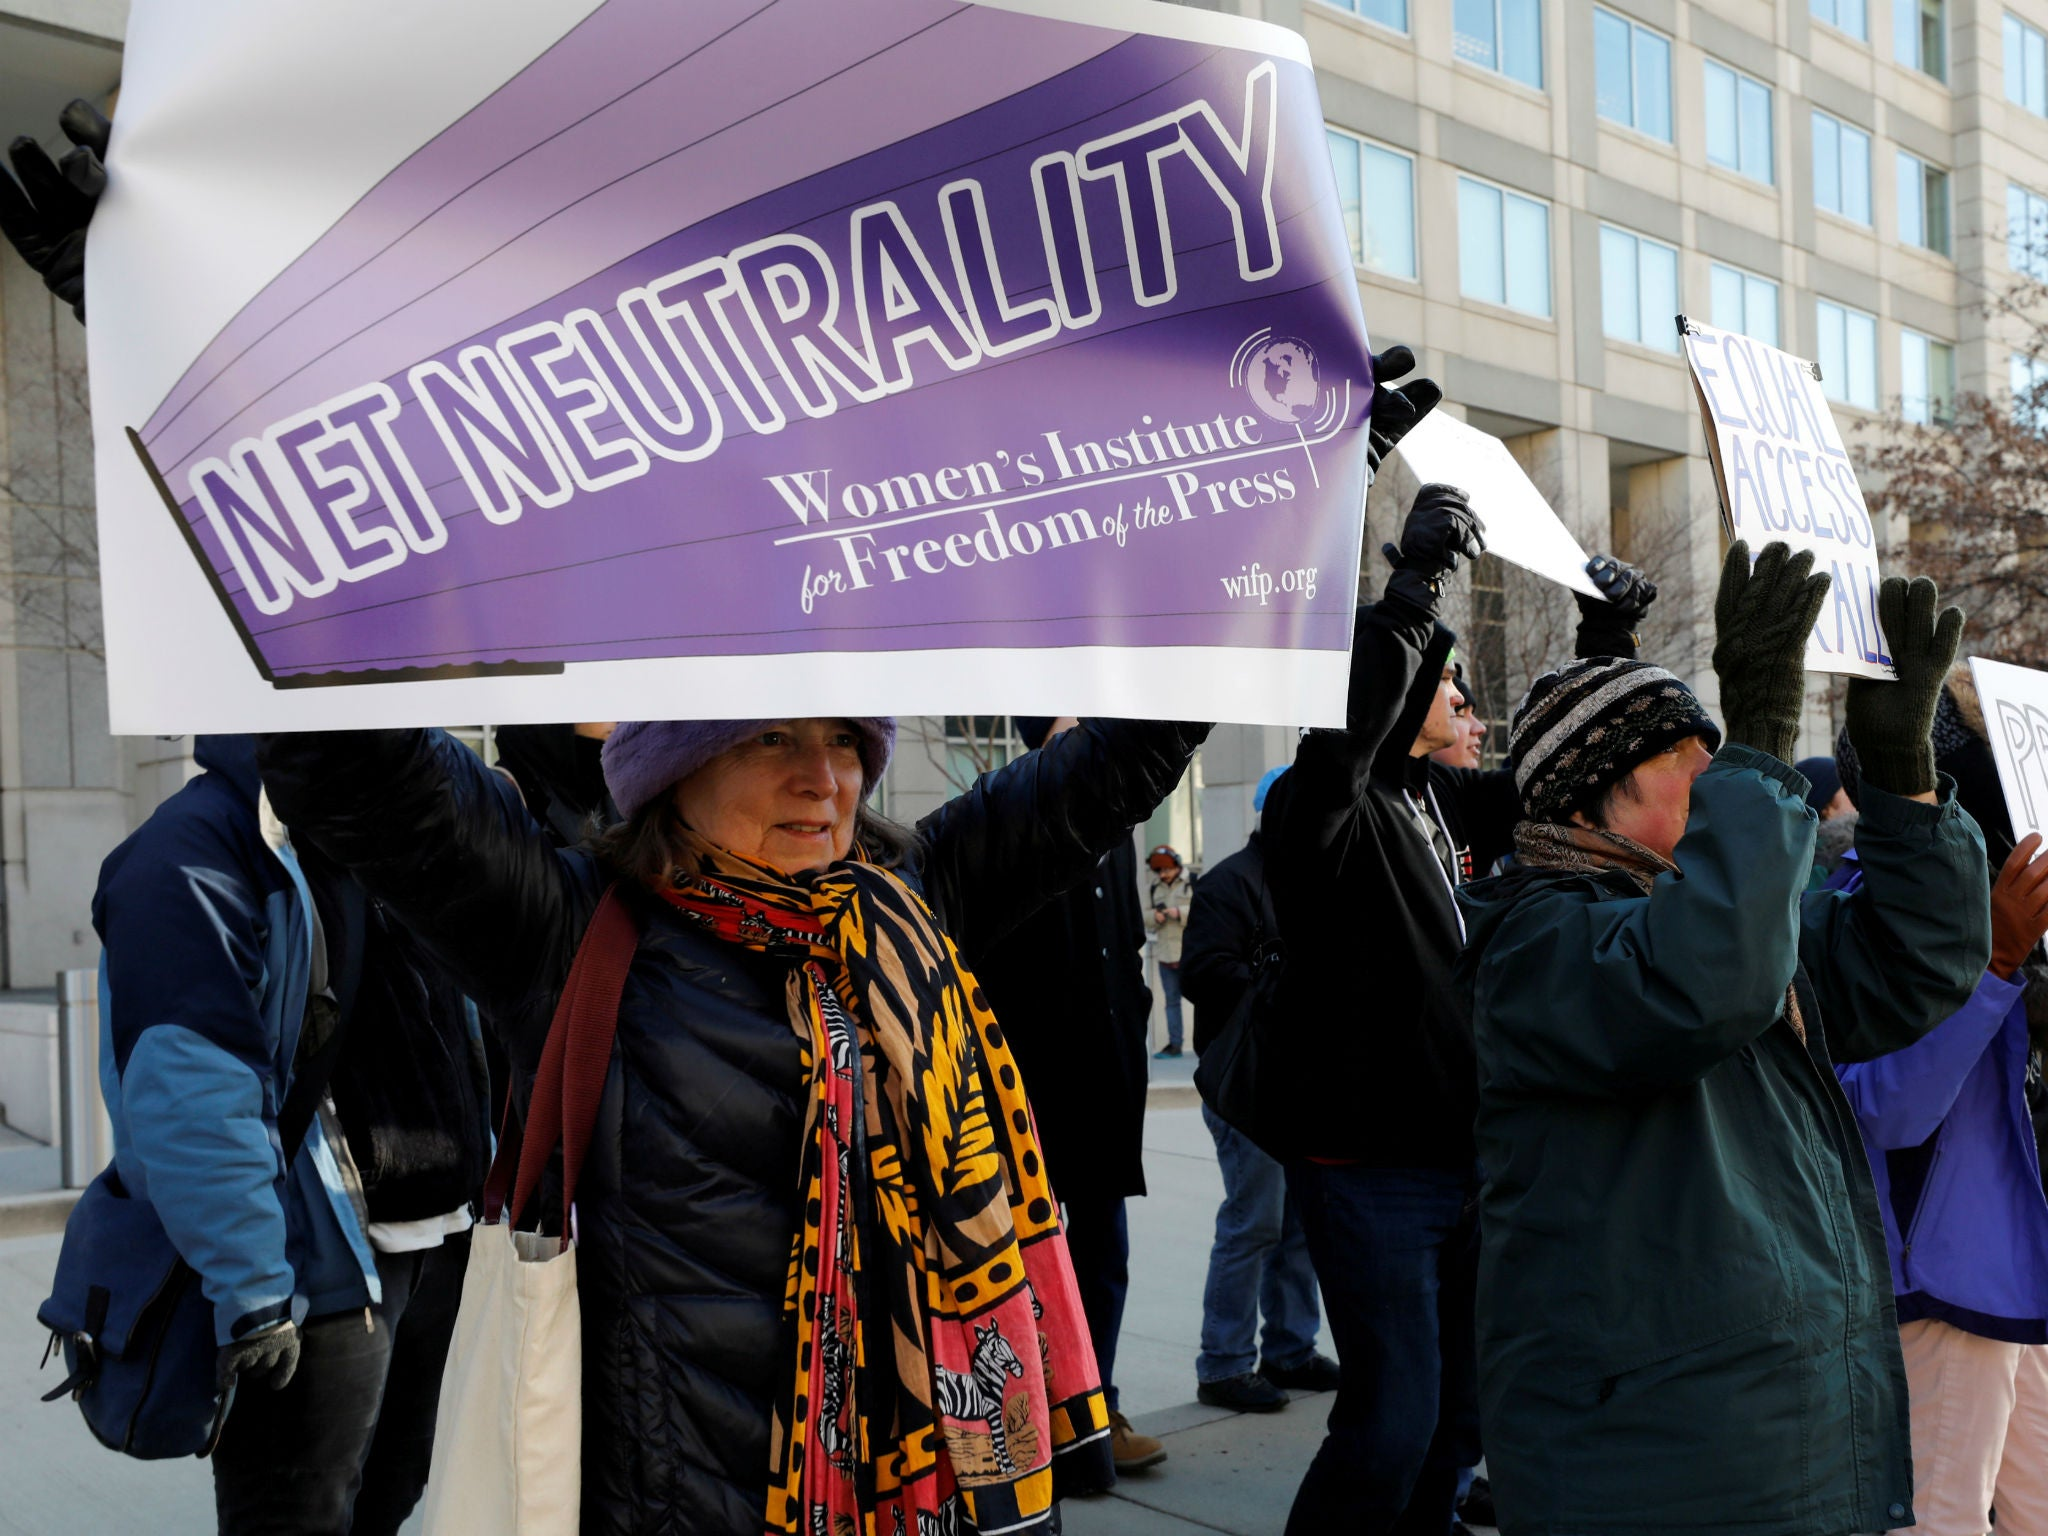 Senate votes to restore net neutrality protections